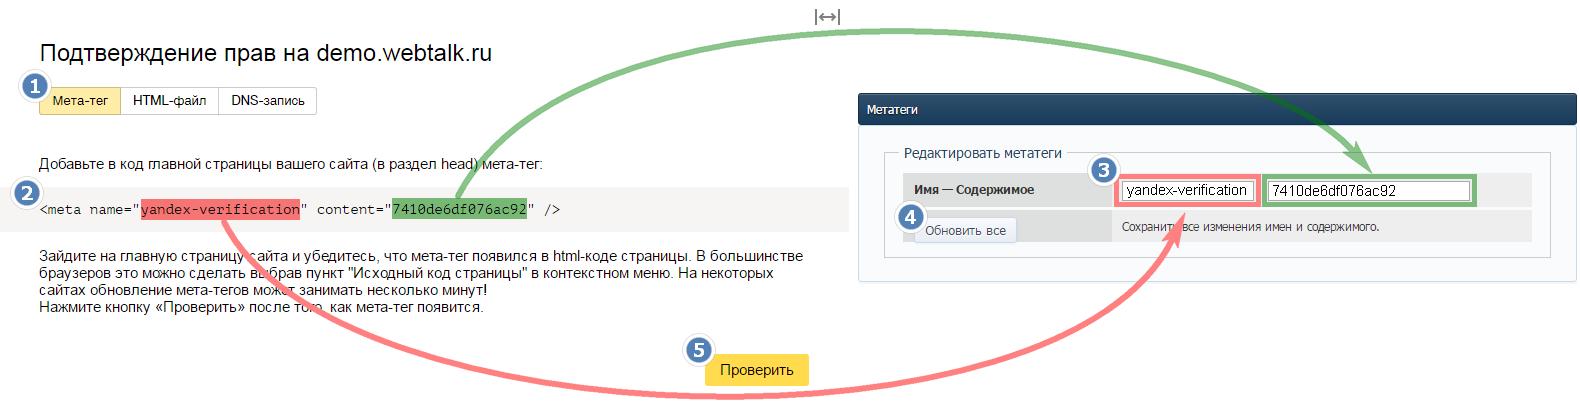 http://s3.uploads.ru/28hAS.png